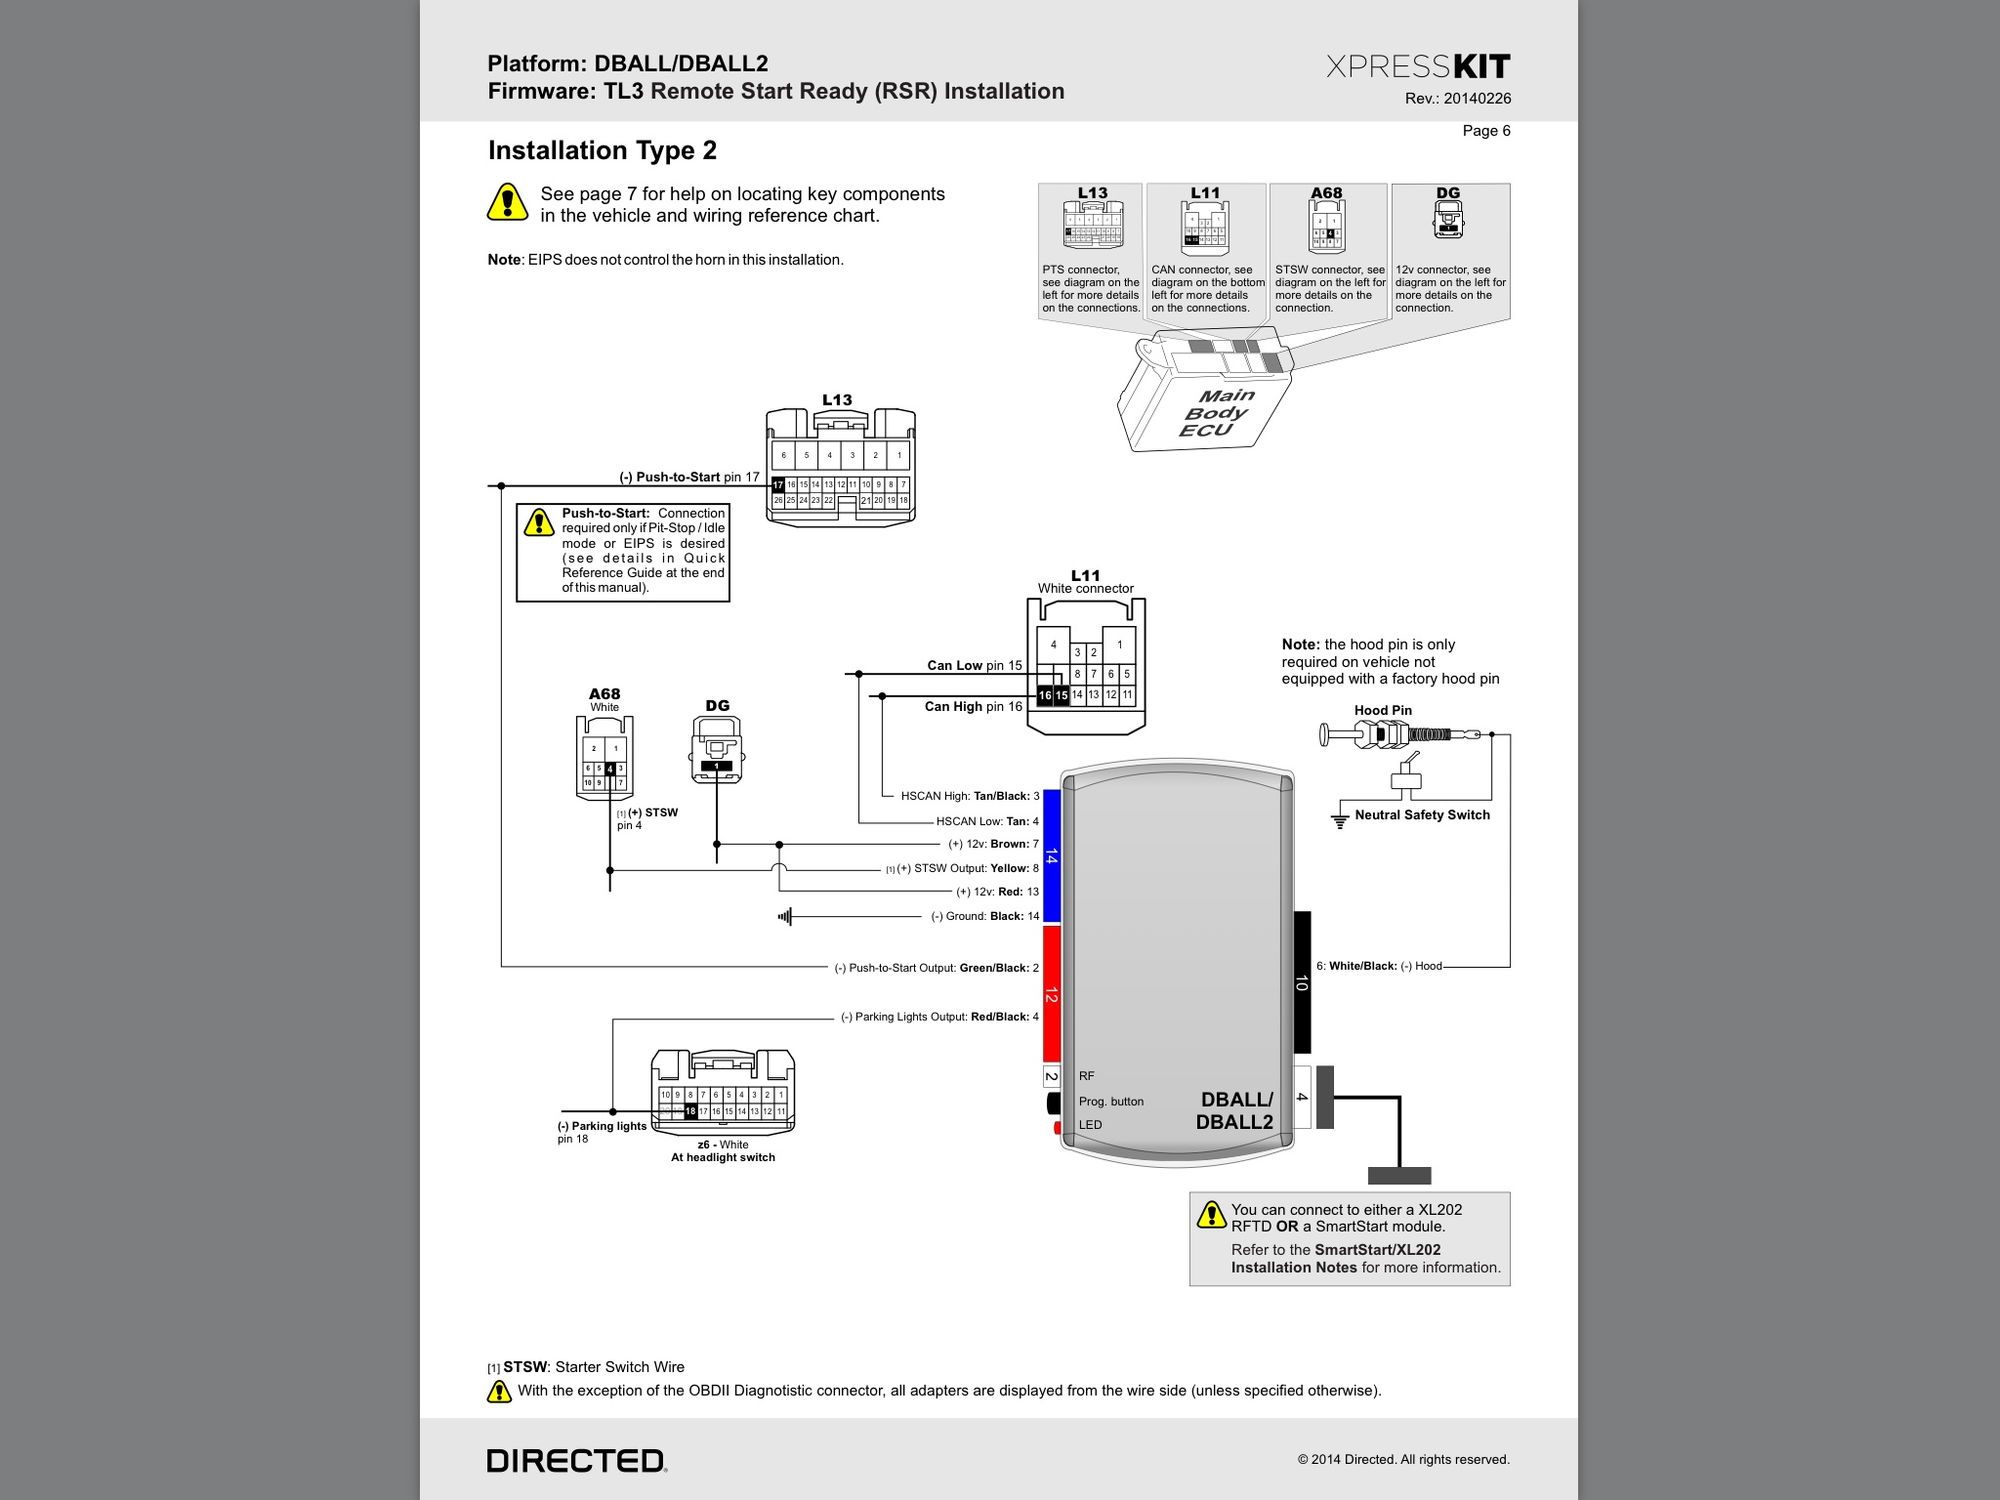 80 image_8d50fc65ce81b48b43b6cf5a87dee1726334f9b7?resize=665%2C499 1999 cougar remote start wire diagram 1999 wiring diagrams Bulldog Remote Start Wiring Diagram at mr168.co